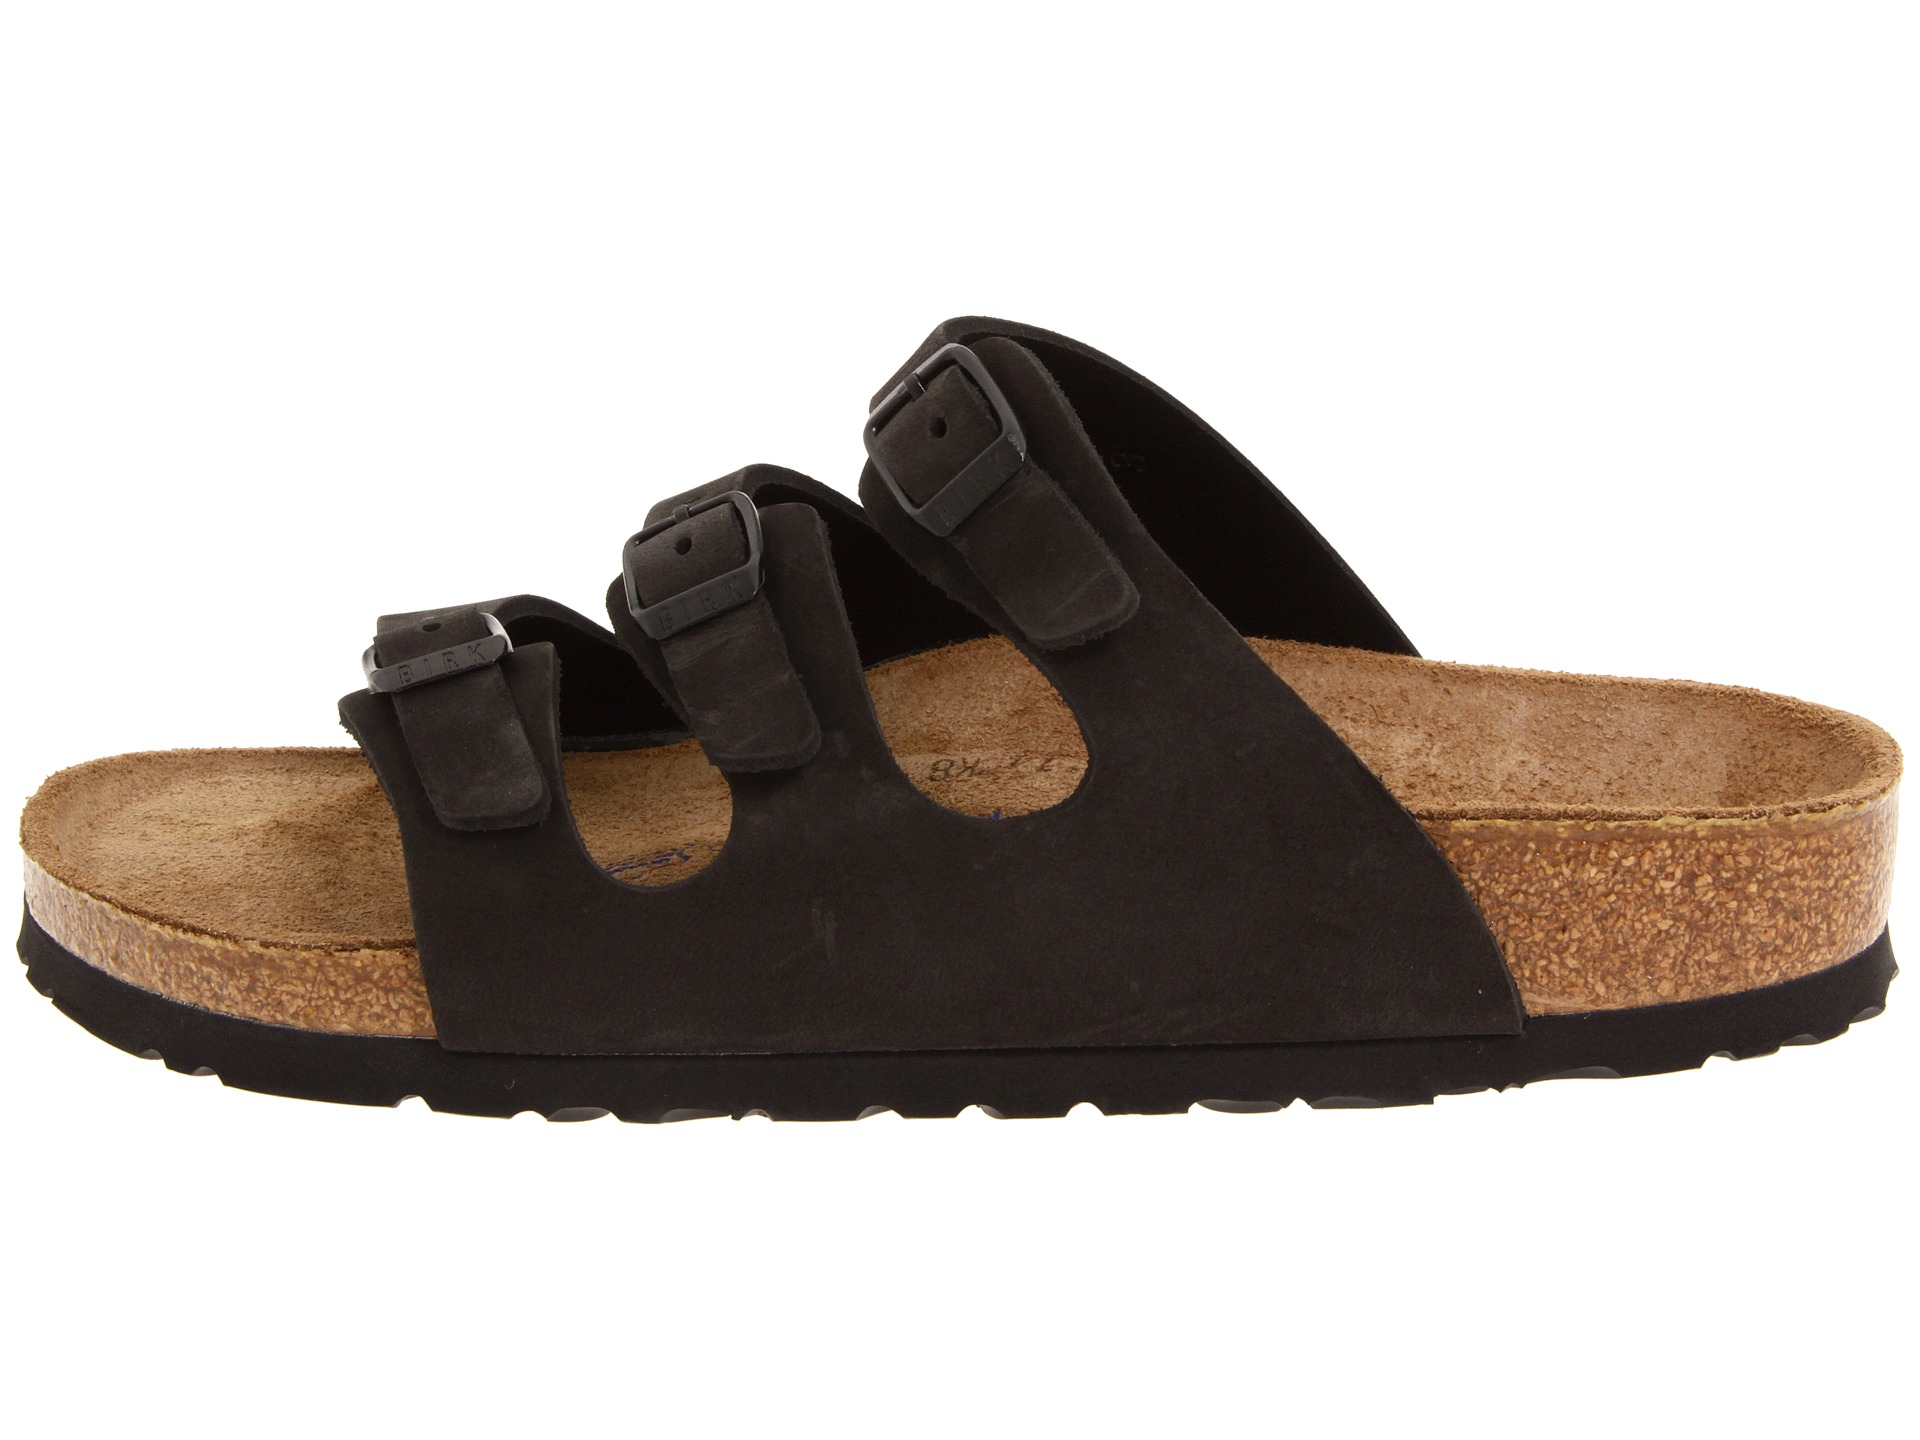 4d5aec66d Birkenstock   Arizona Sandals Velour Taupe Birki Clogs